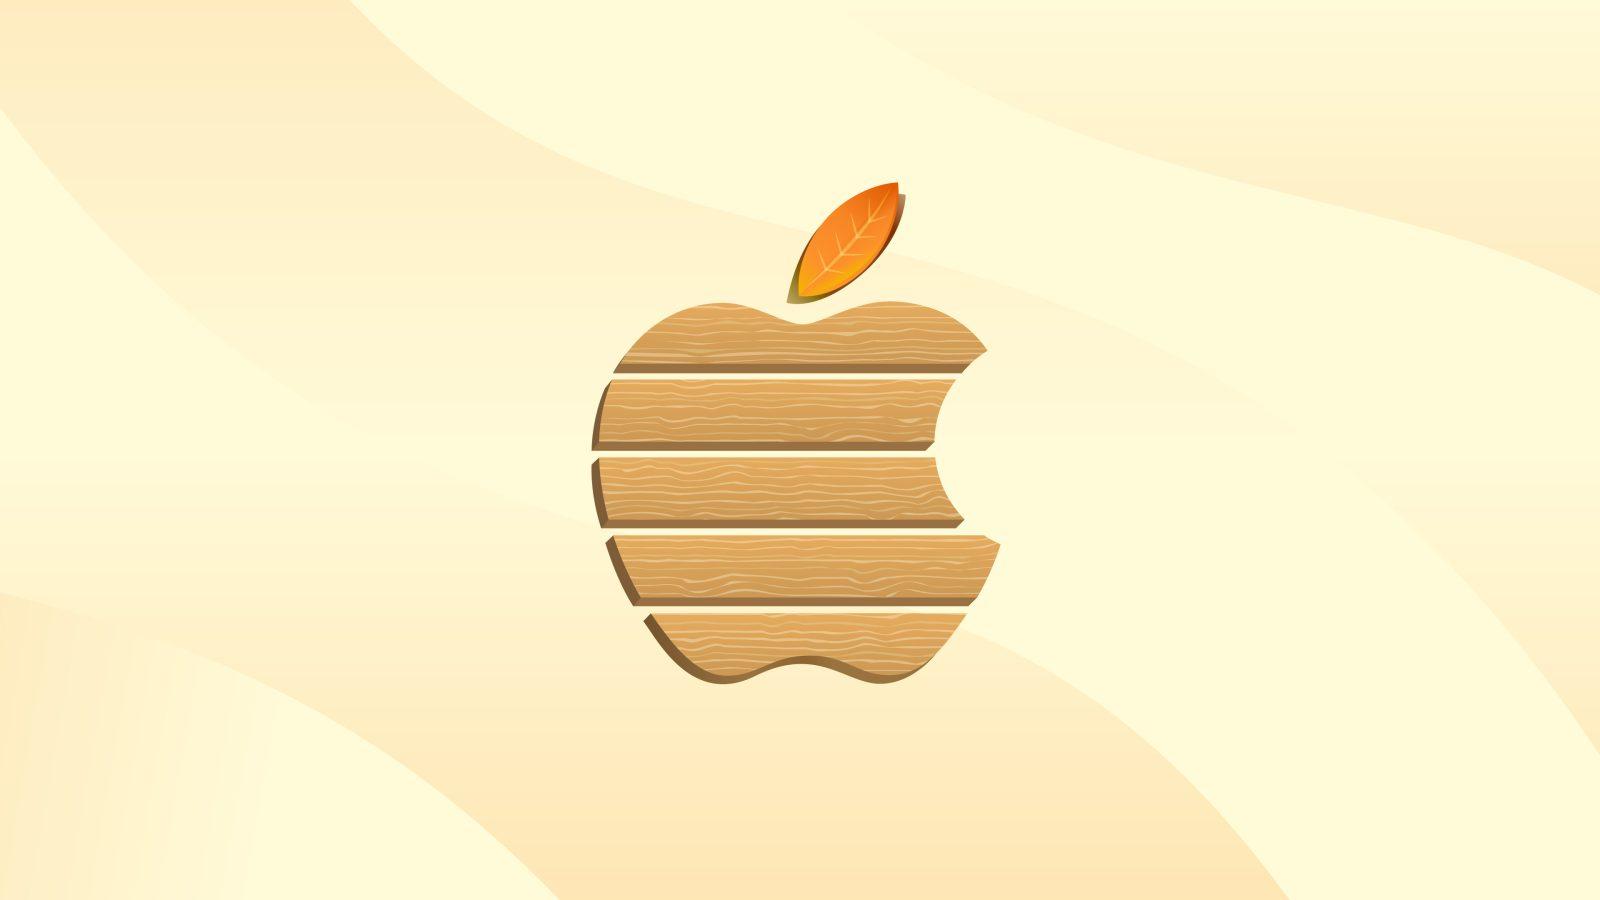 New Old Orchard Apple Store arriving September 28 in Skokie, Illinois